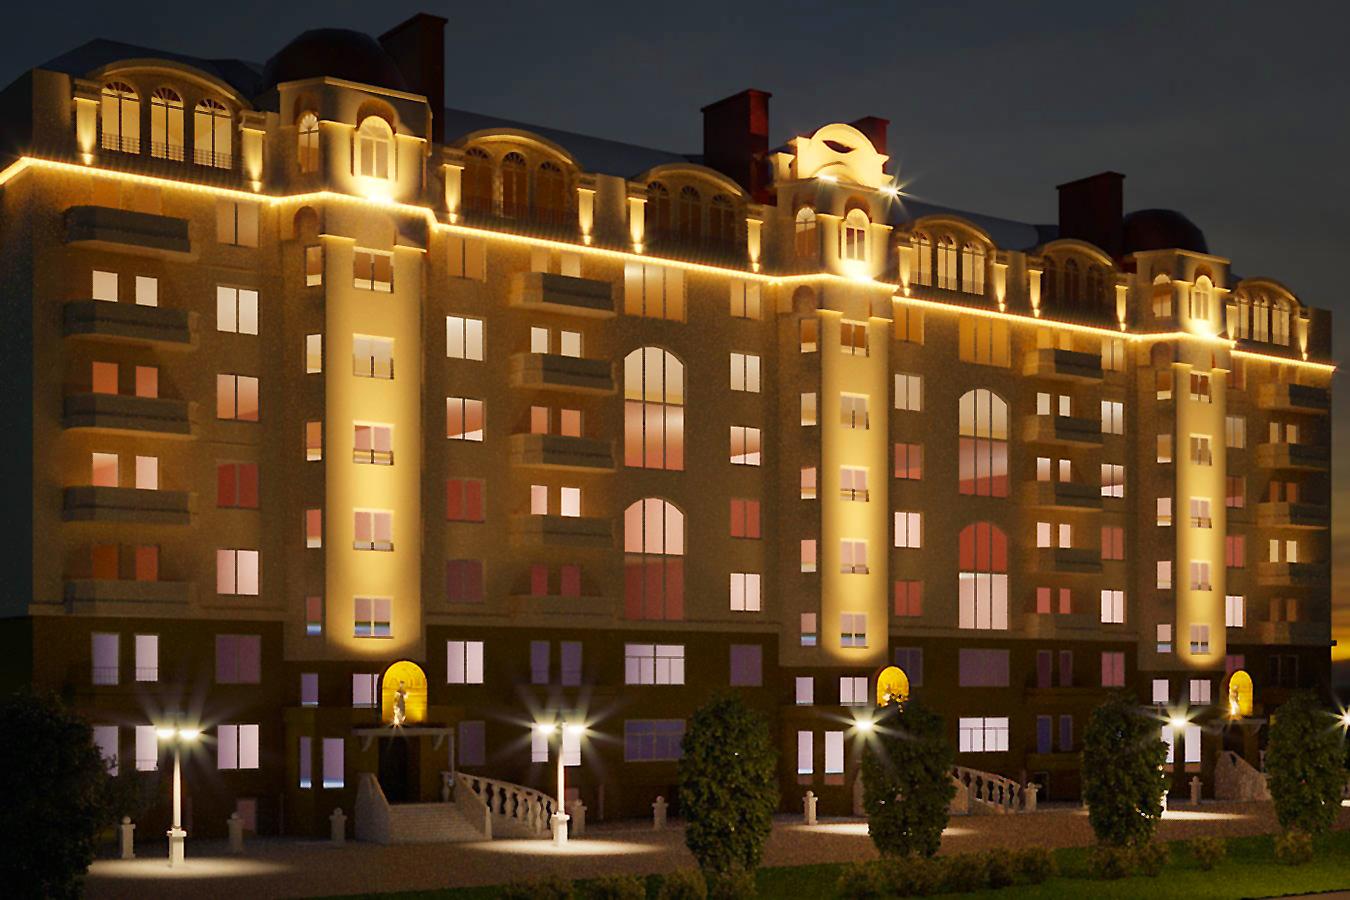 Light scheme for building in 3d max corona render image